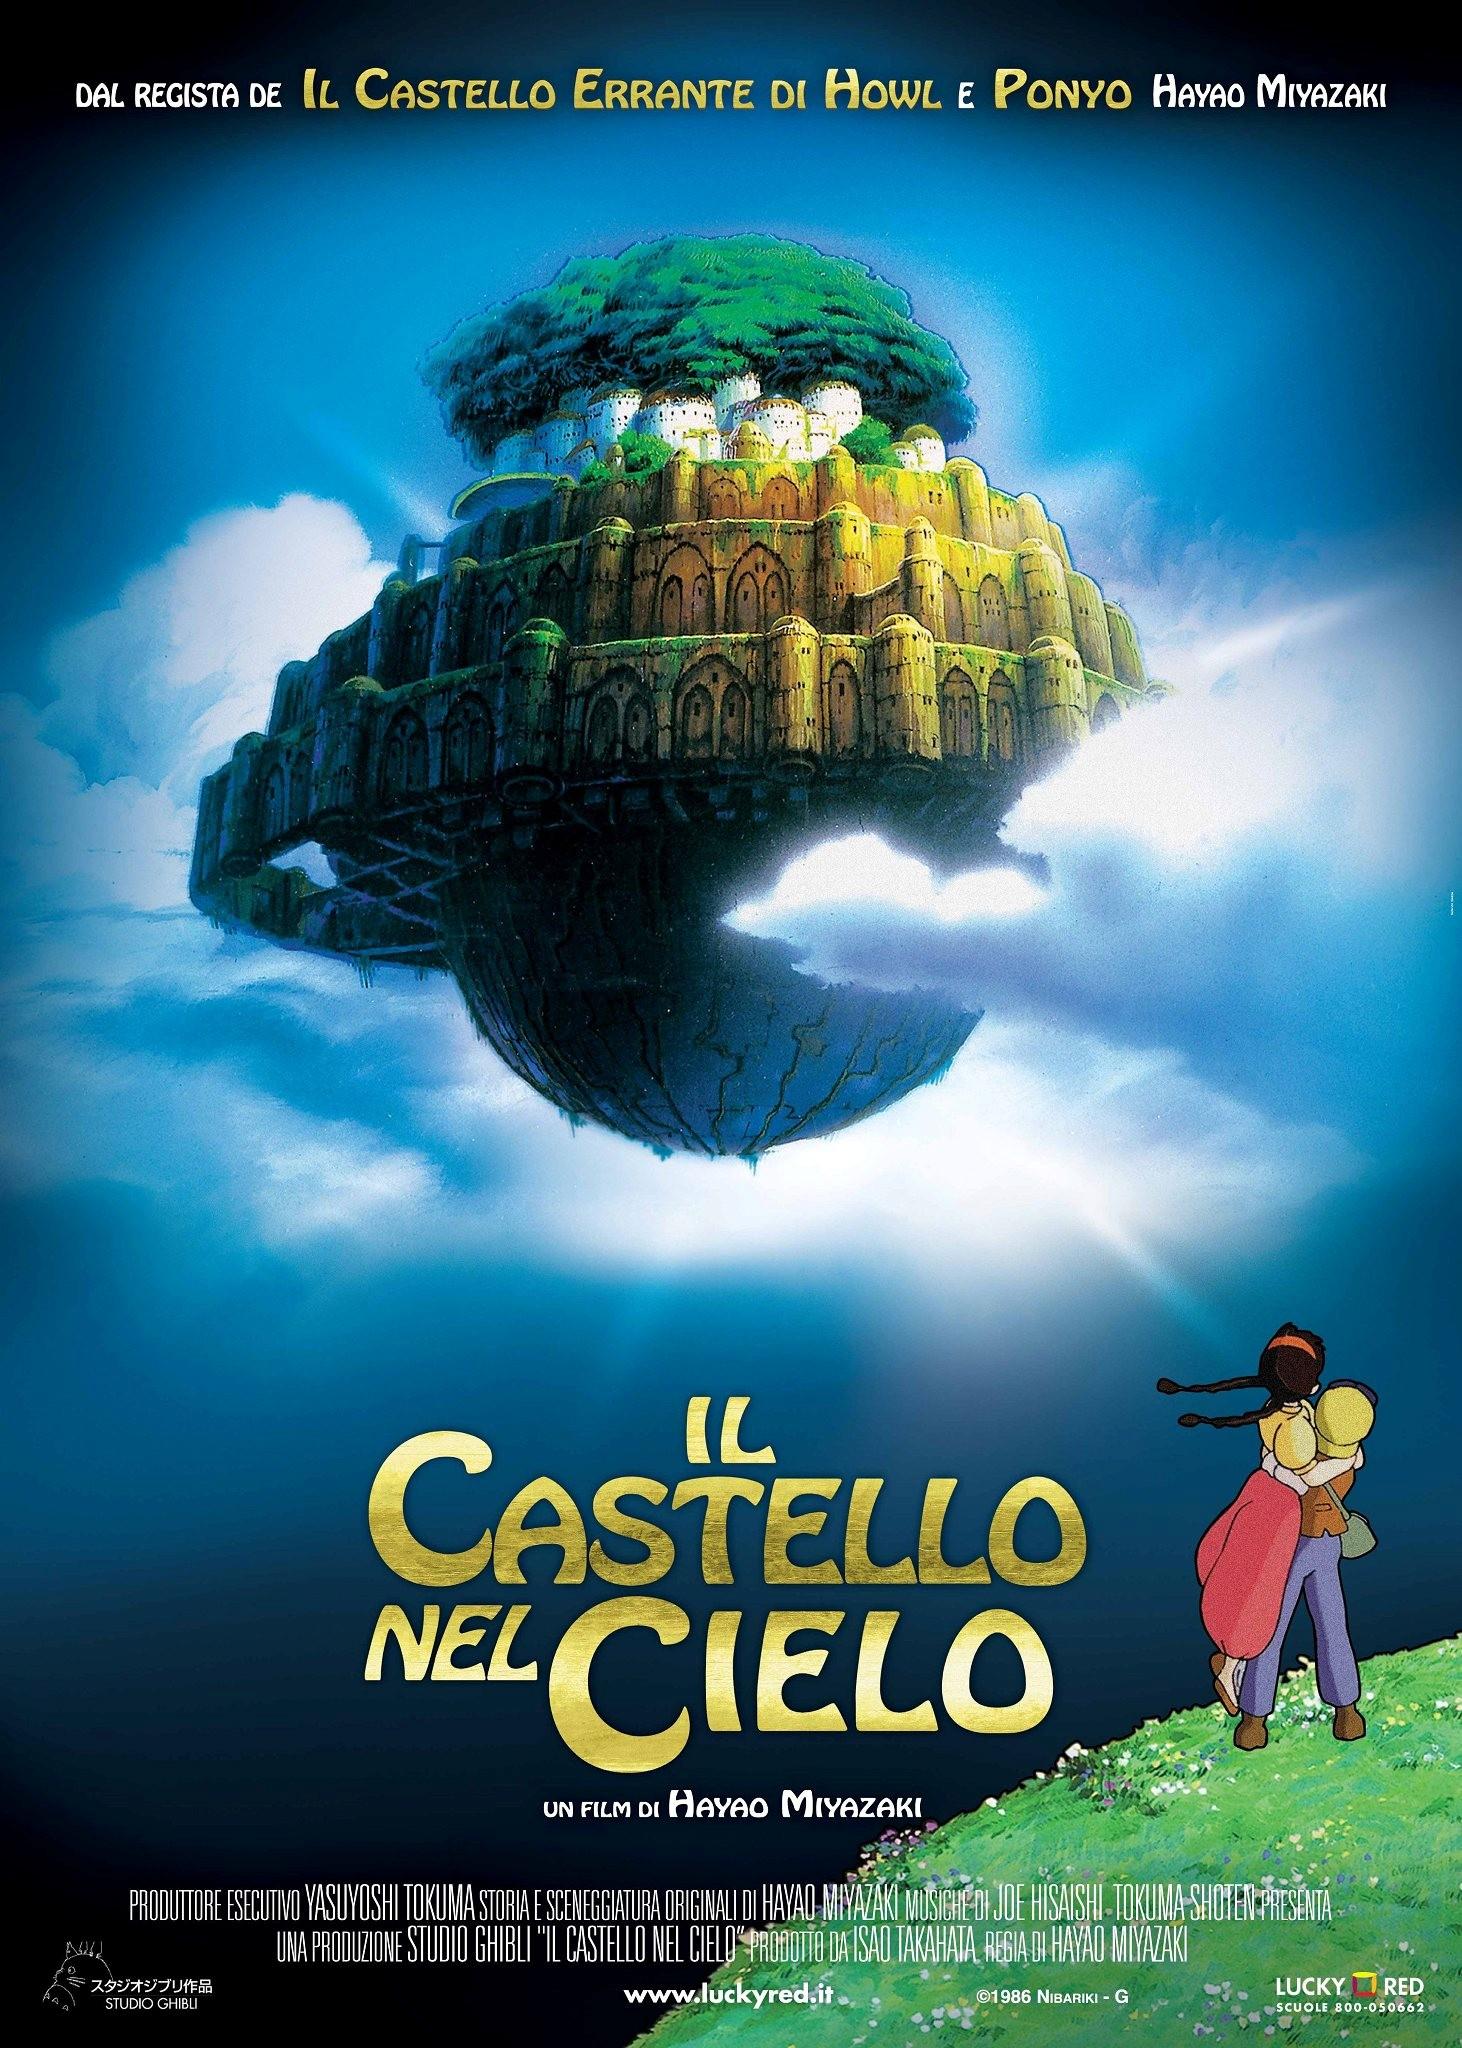 Castello nel cielo laputa locandina miyazaki